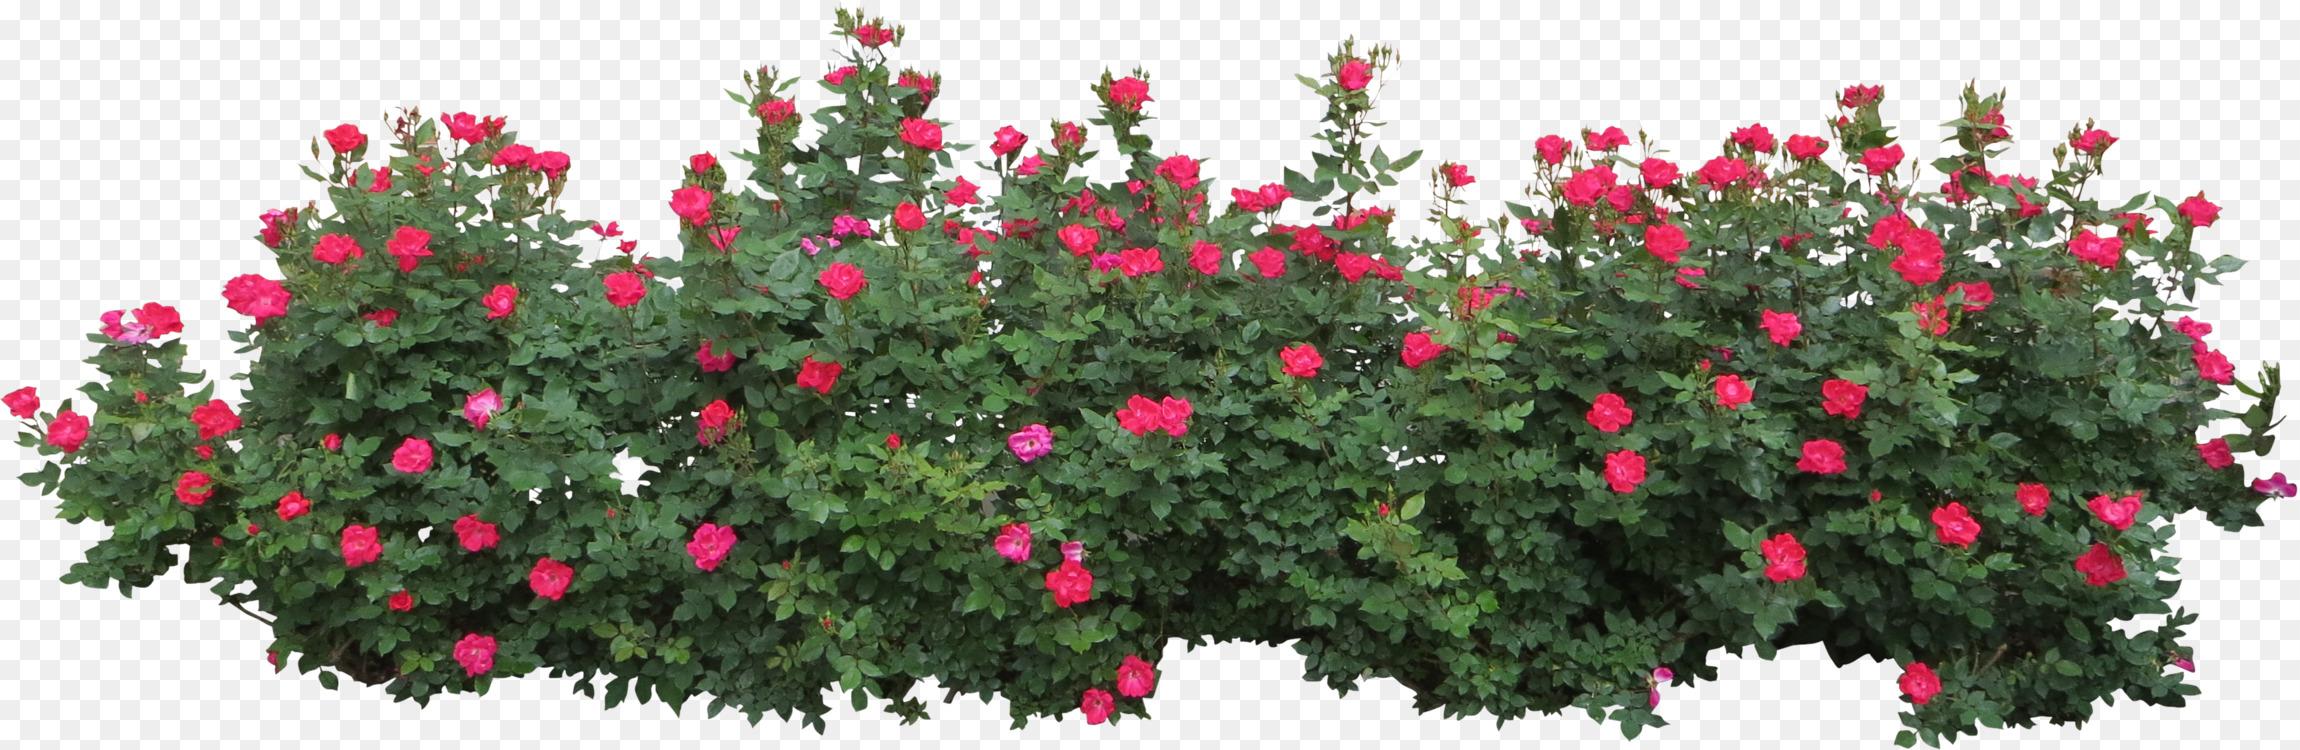 Shrub Rose Pink Flowers Plant Free Png Image Shrubrosebush Free